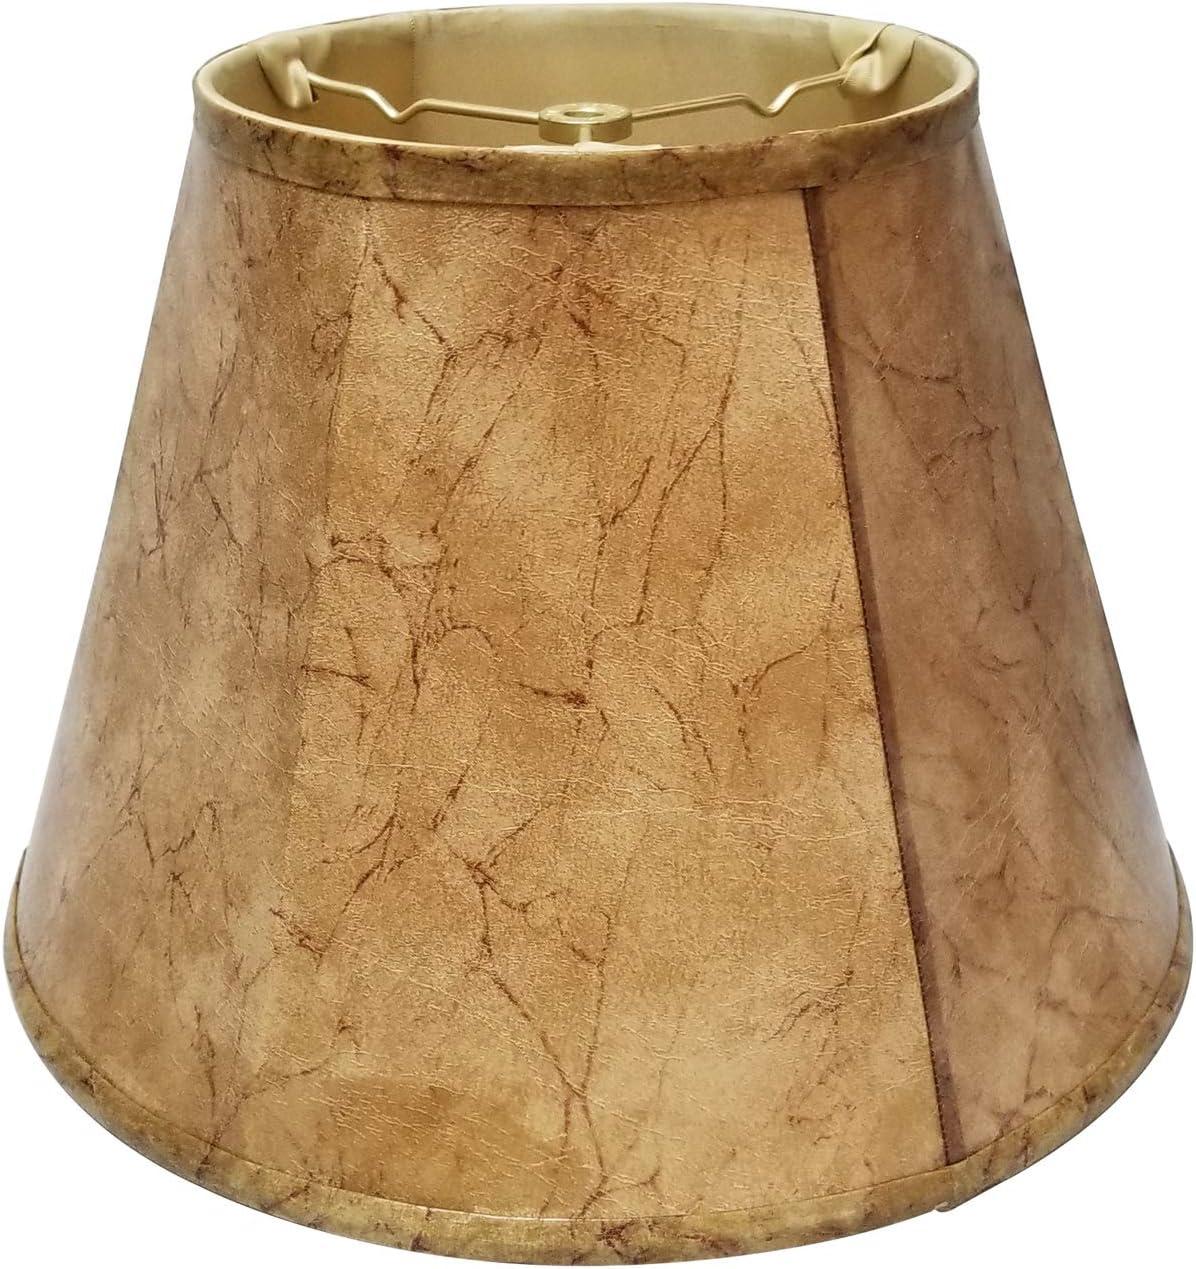 Royal Designs Deep Max 50% OFF Ranking TOP17 Empire Lamp Shade Rawhide 14 11 Faux 8 x